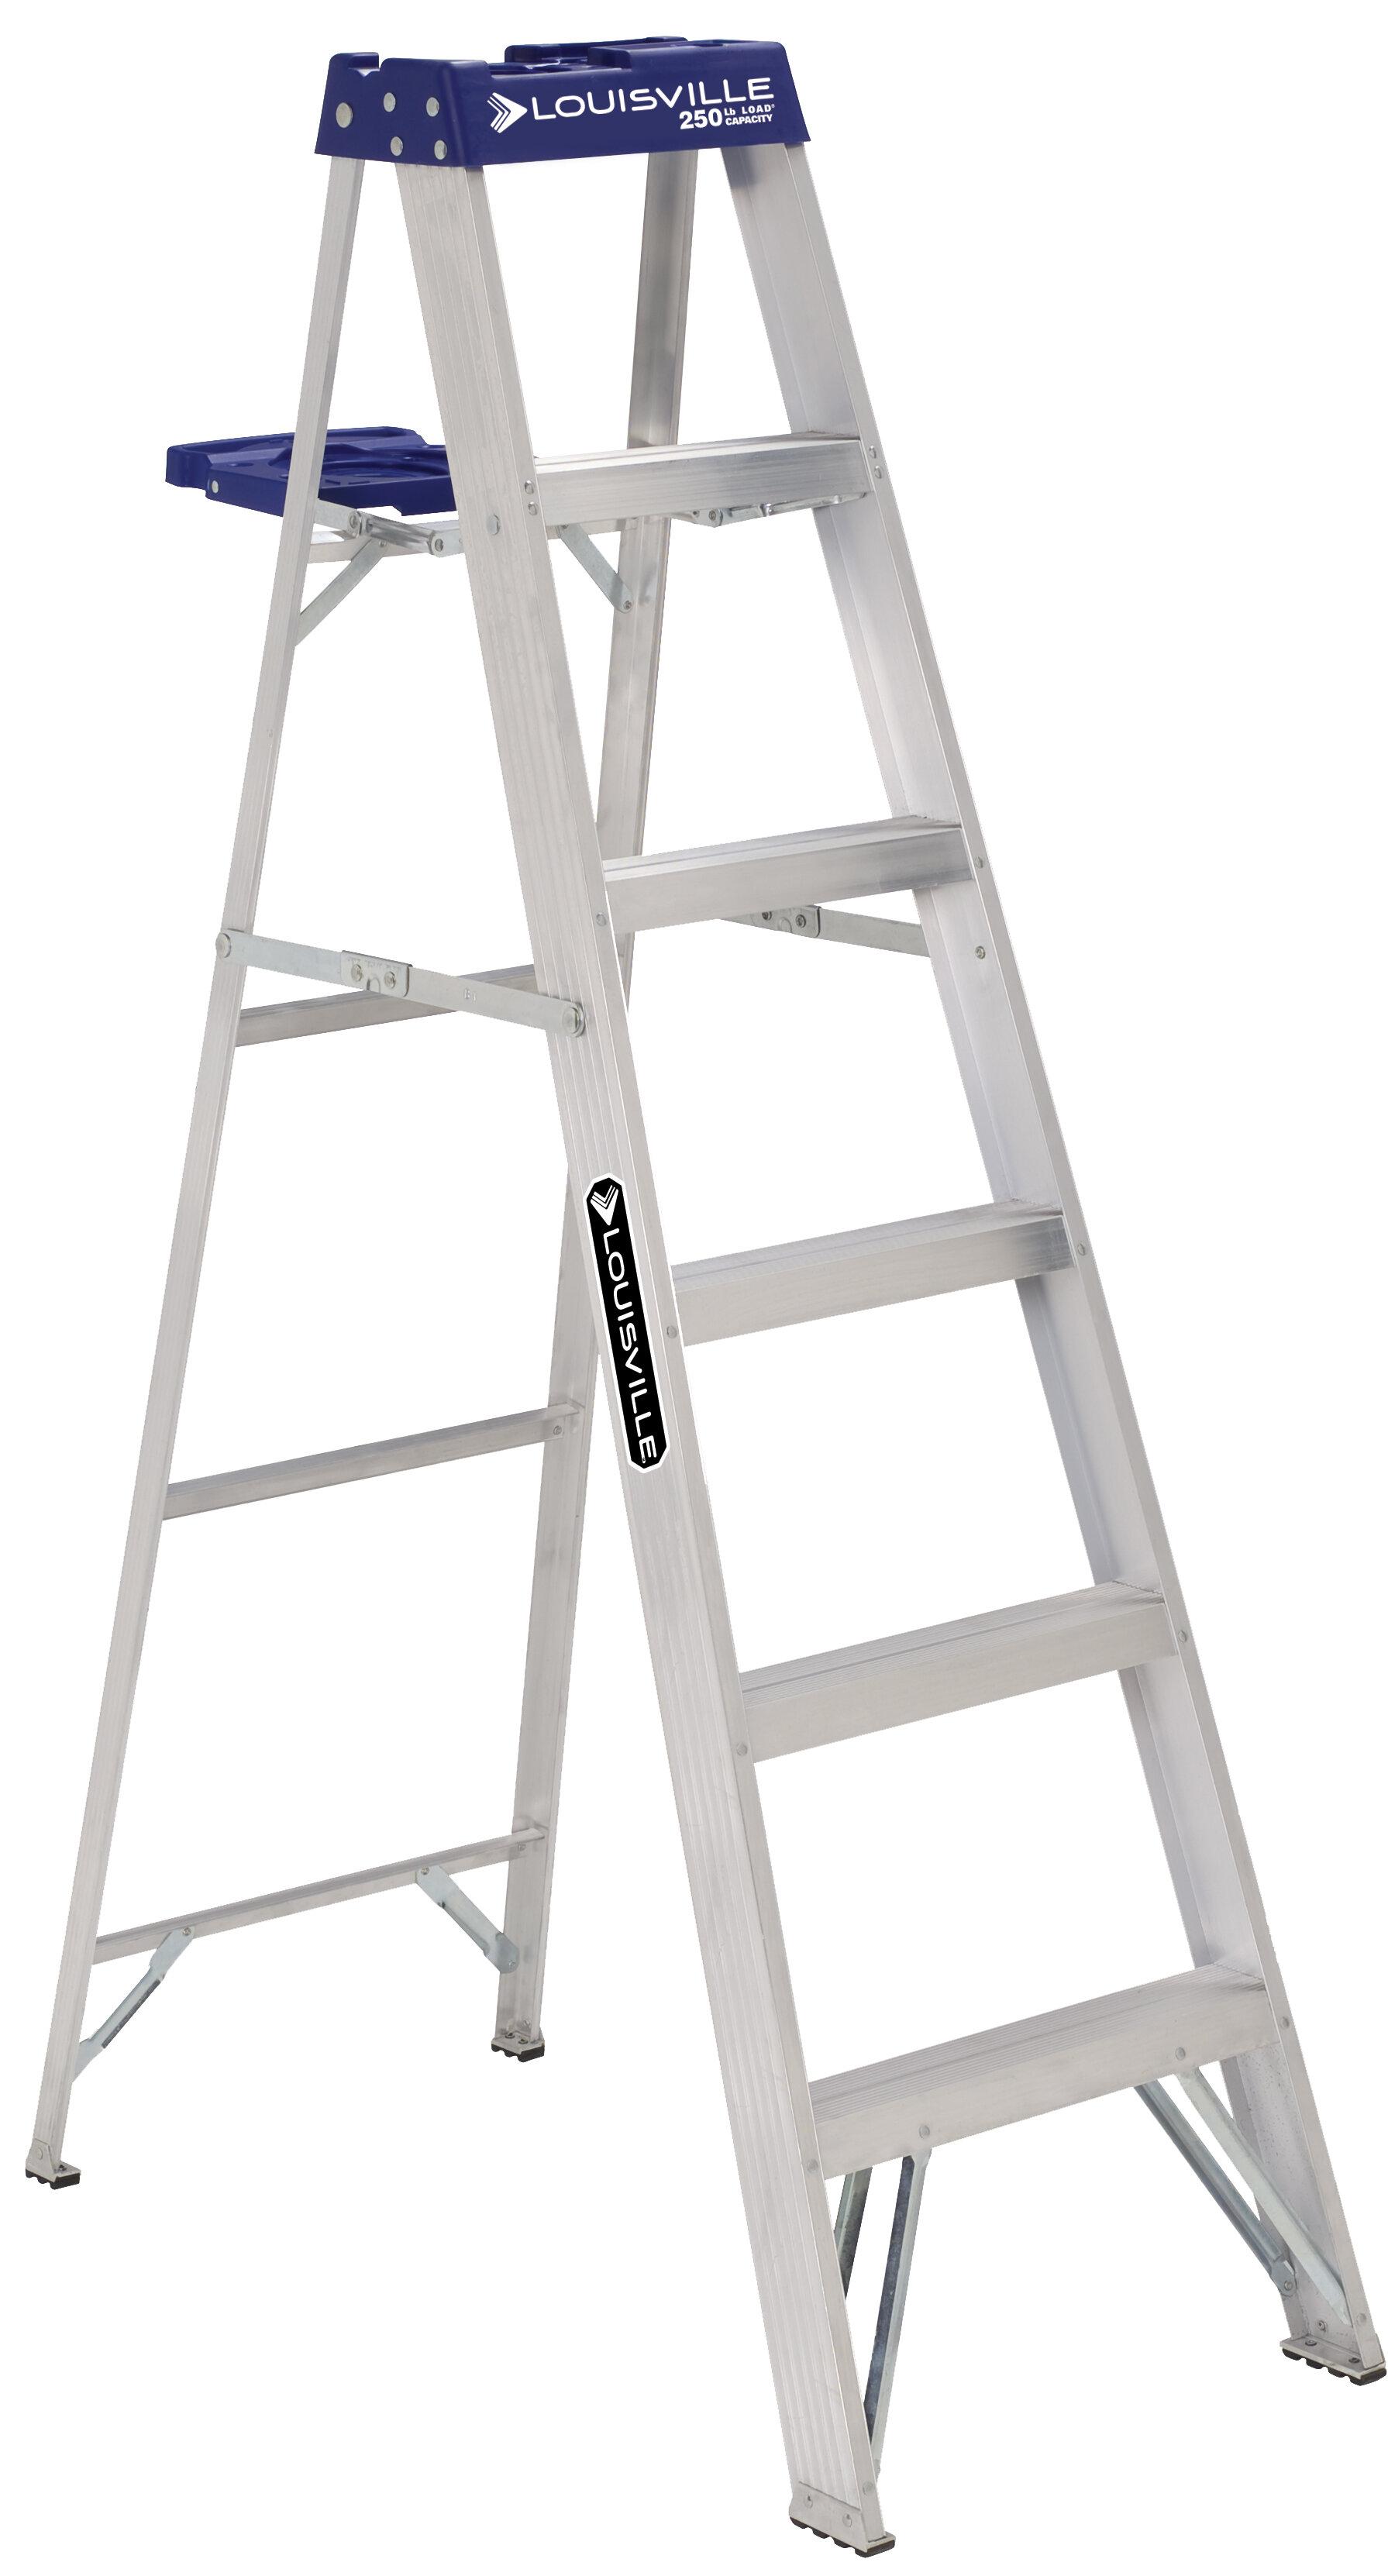 Louisville Ladder 6 Ft Aluminum Step Ladder Type I 250 Lb Load Capacity As2106 Wayfair